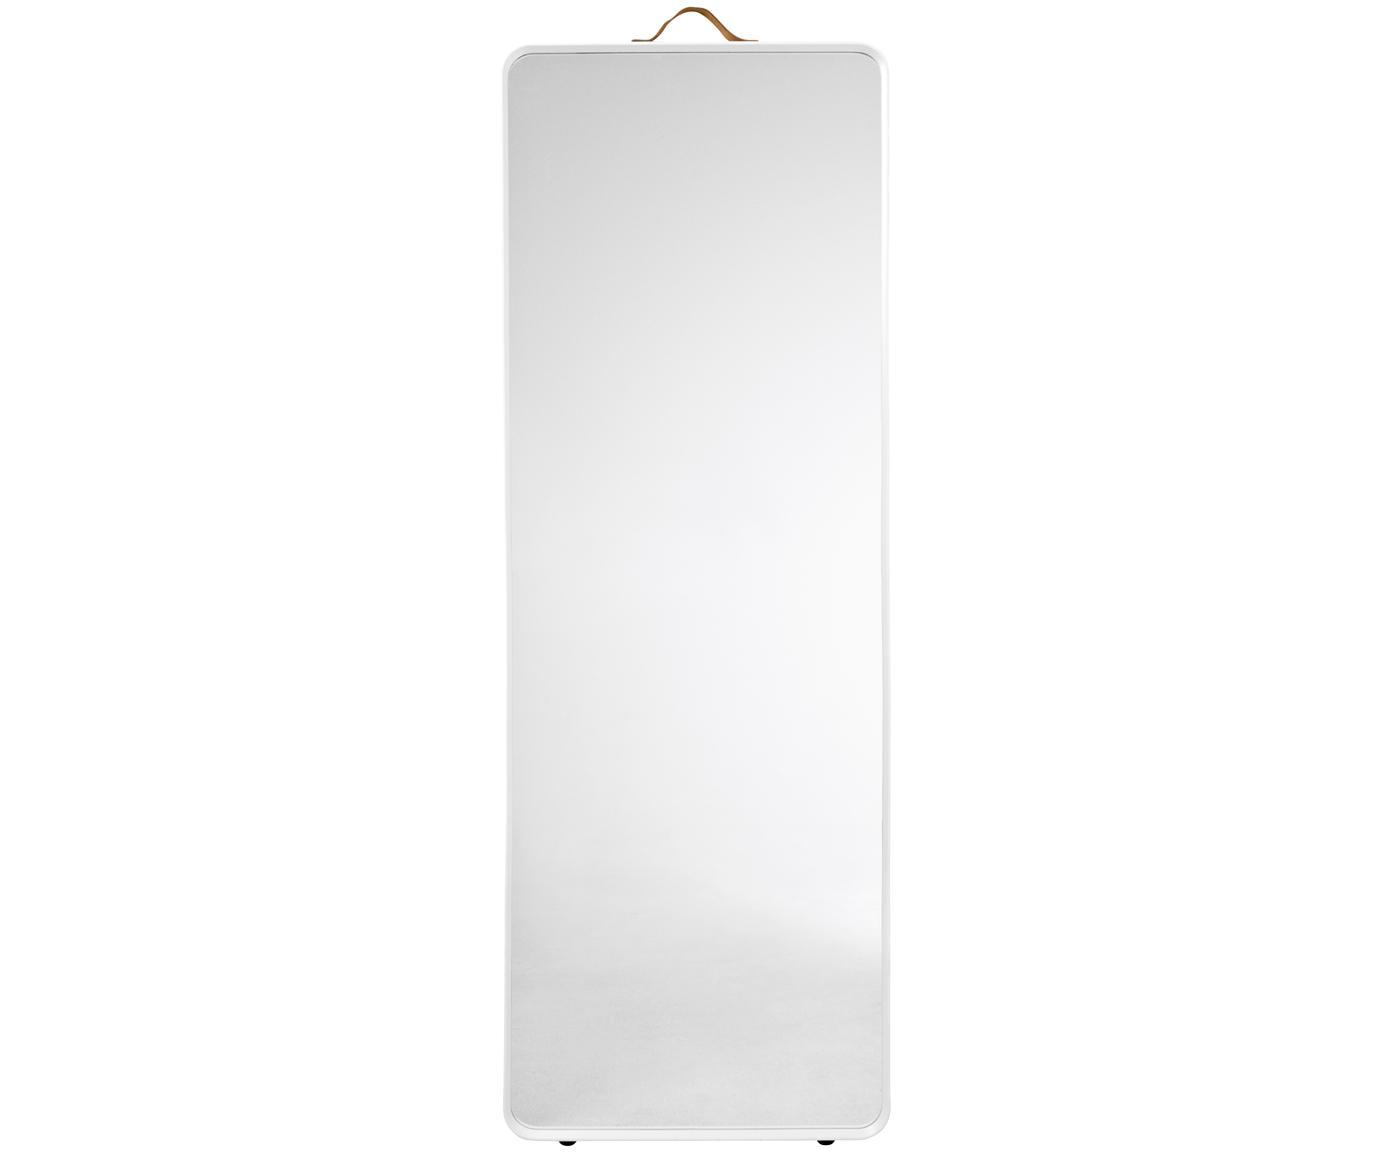 Wandspiegel Norm, Rahmen: Aluminium, pulverbeschich, Griff: Leder, Weiß, 60 x 170 cm